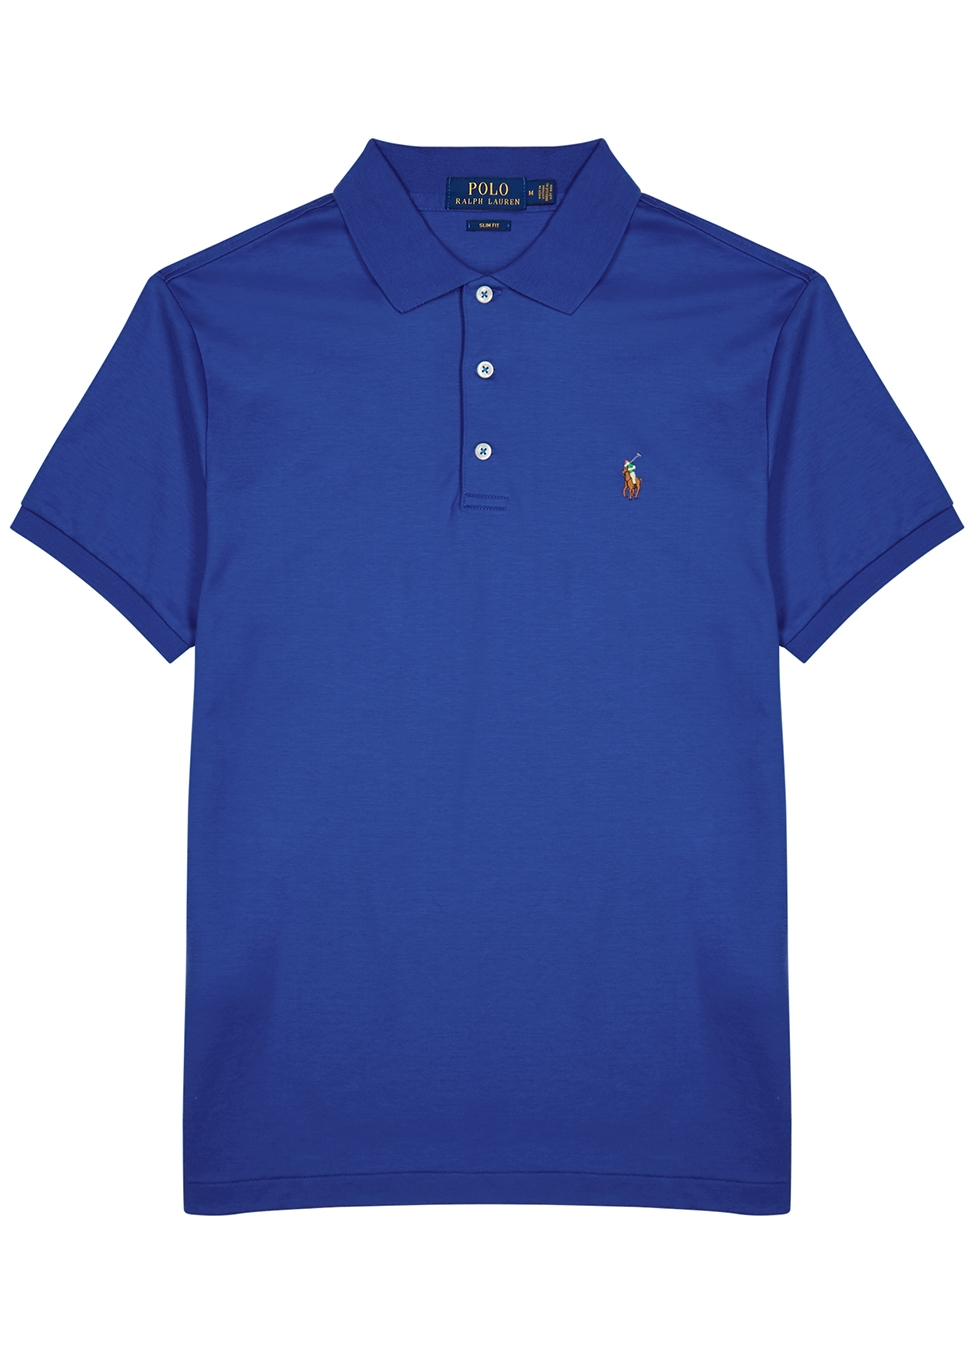 b1f7ee551f Polo Ralph Lauren Blue slim Pima cotton polo shirt - Harvey Nichols